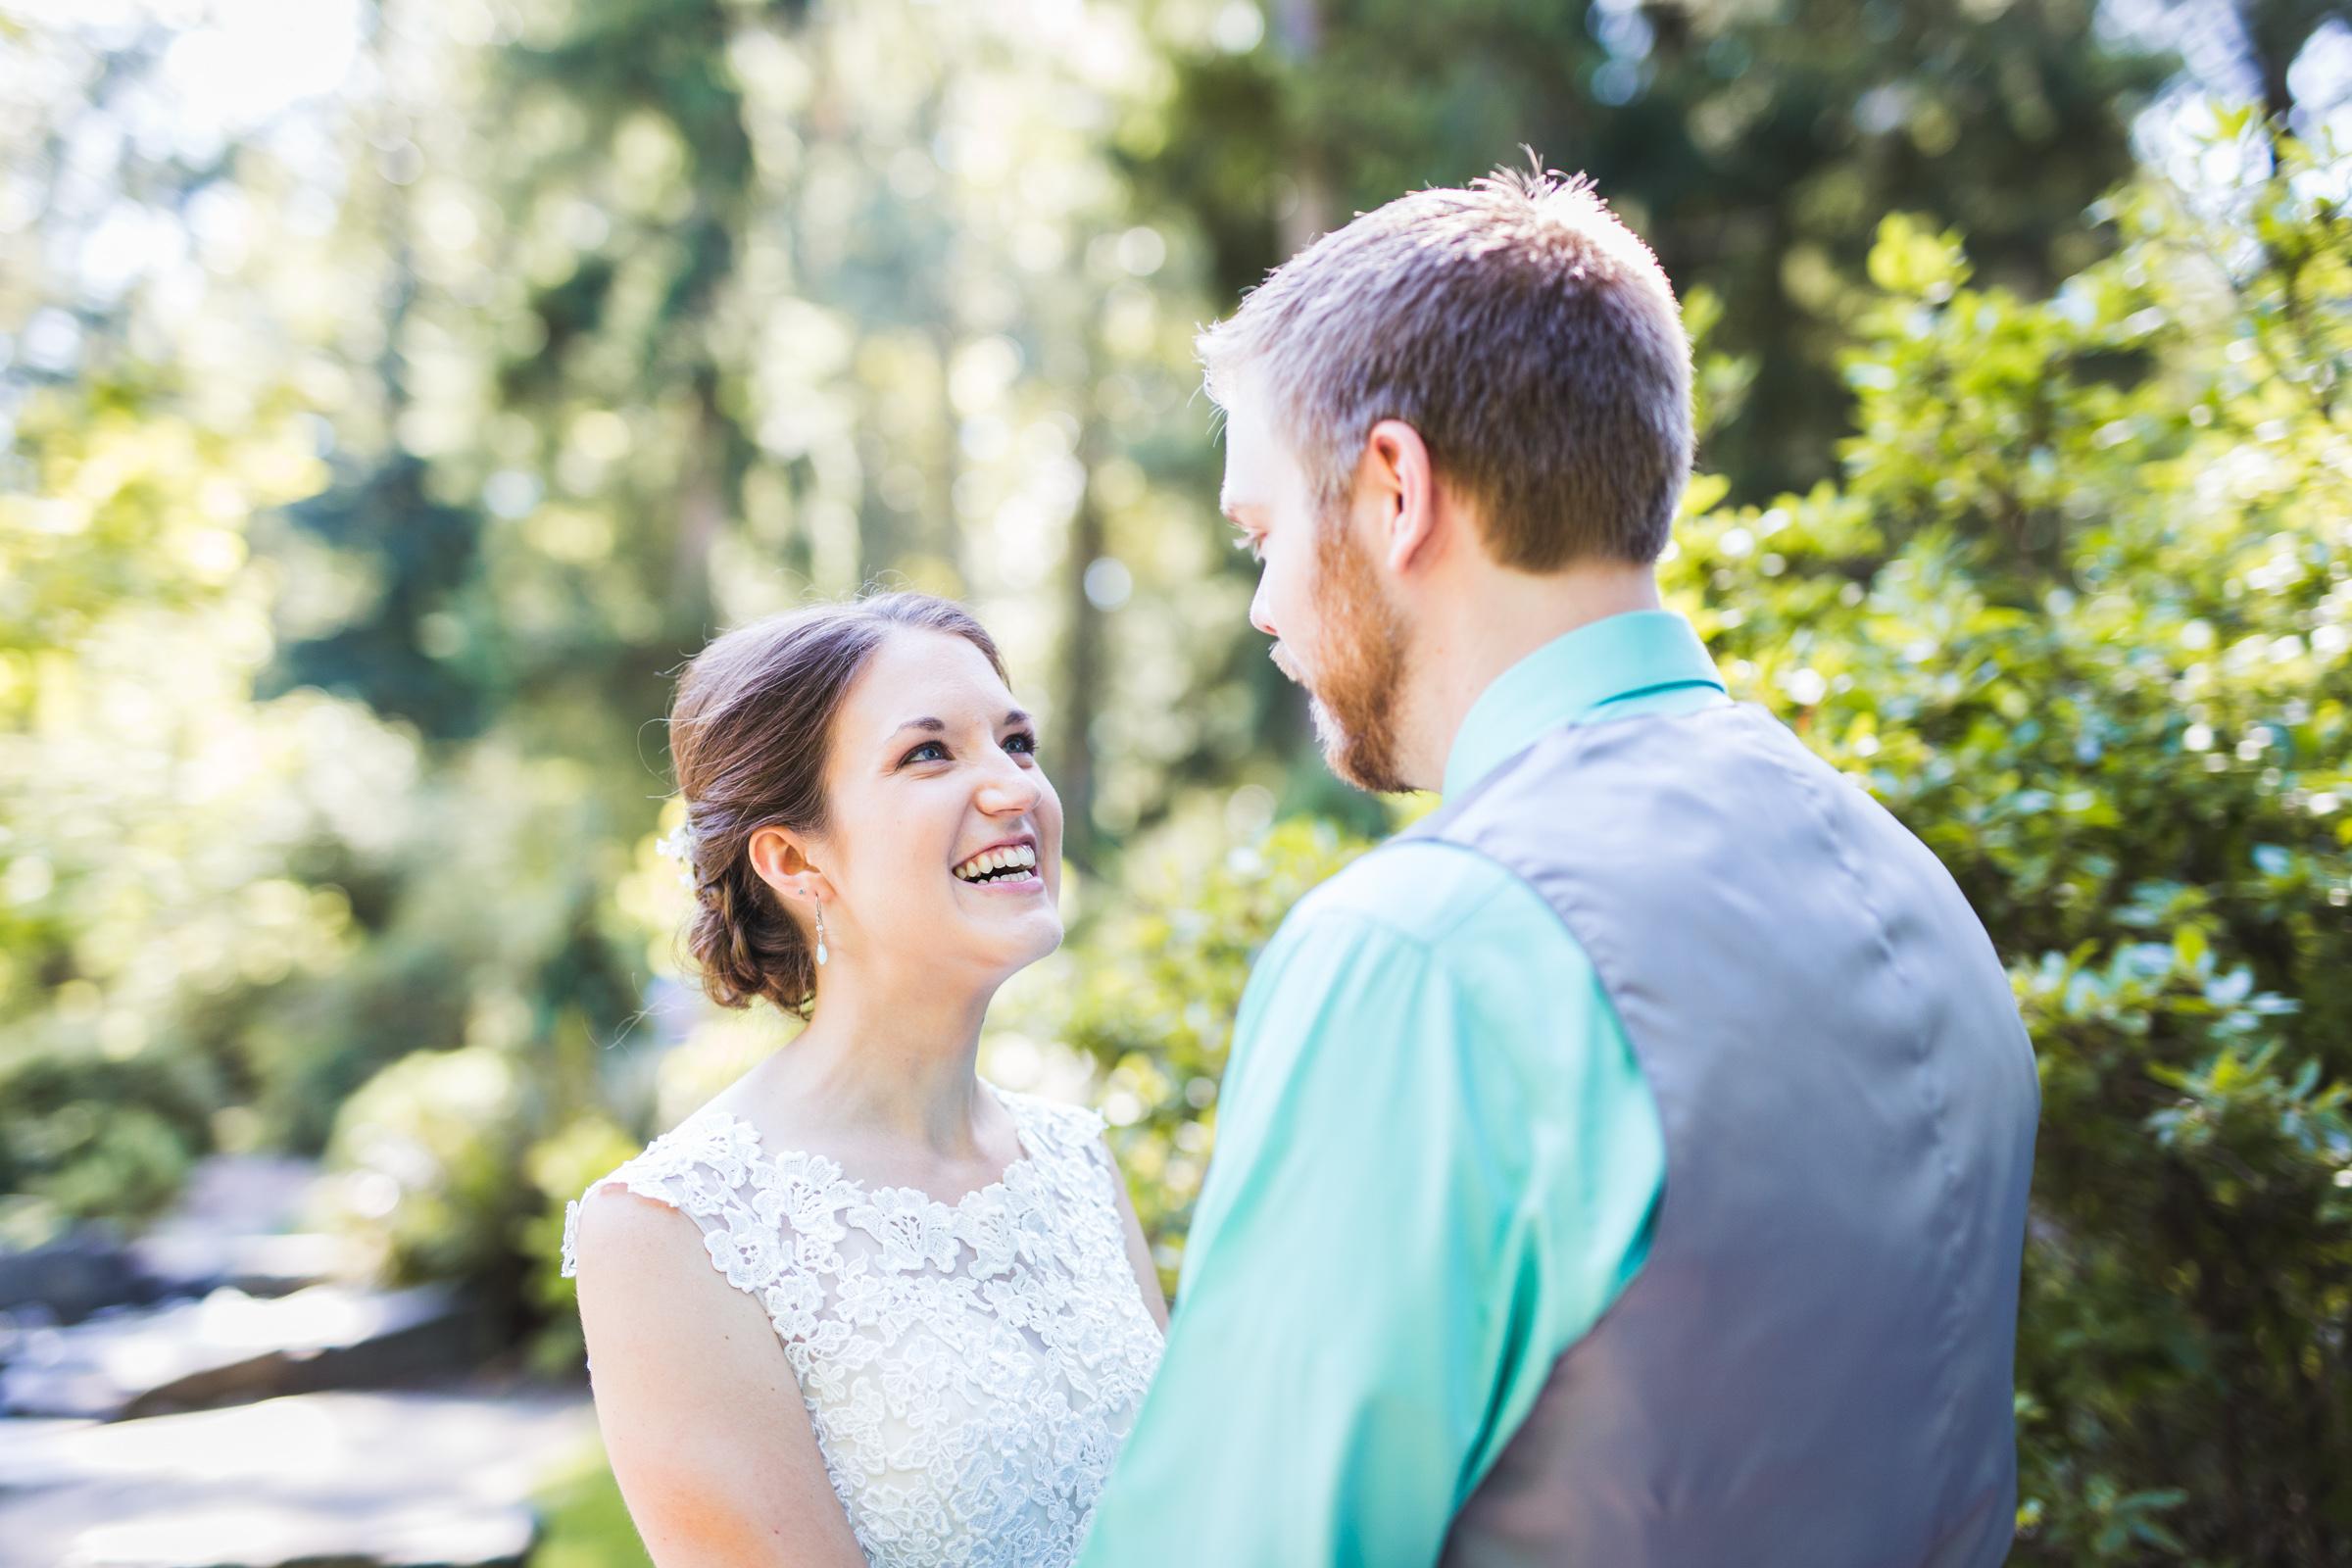 LukeSarah-Seattle-Wedding-080516-0023.jpg